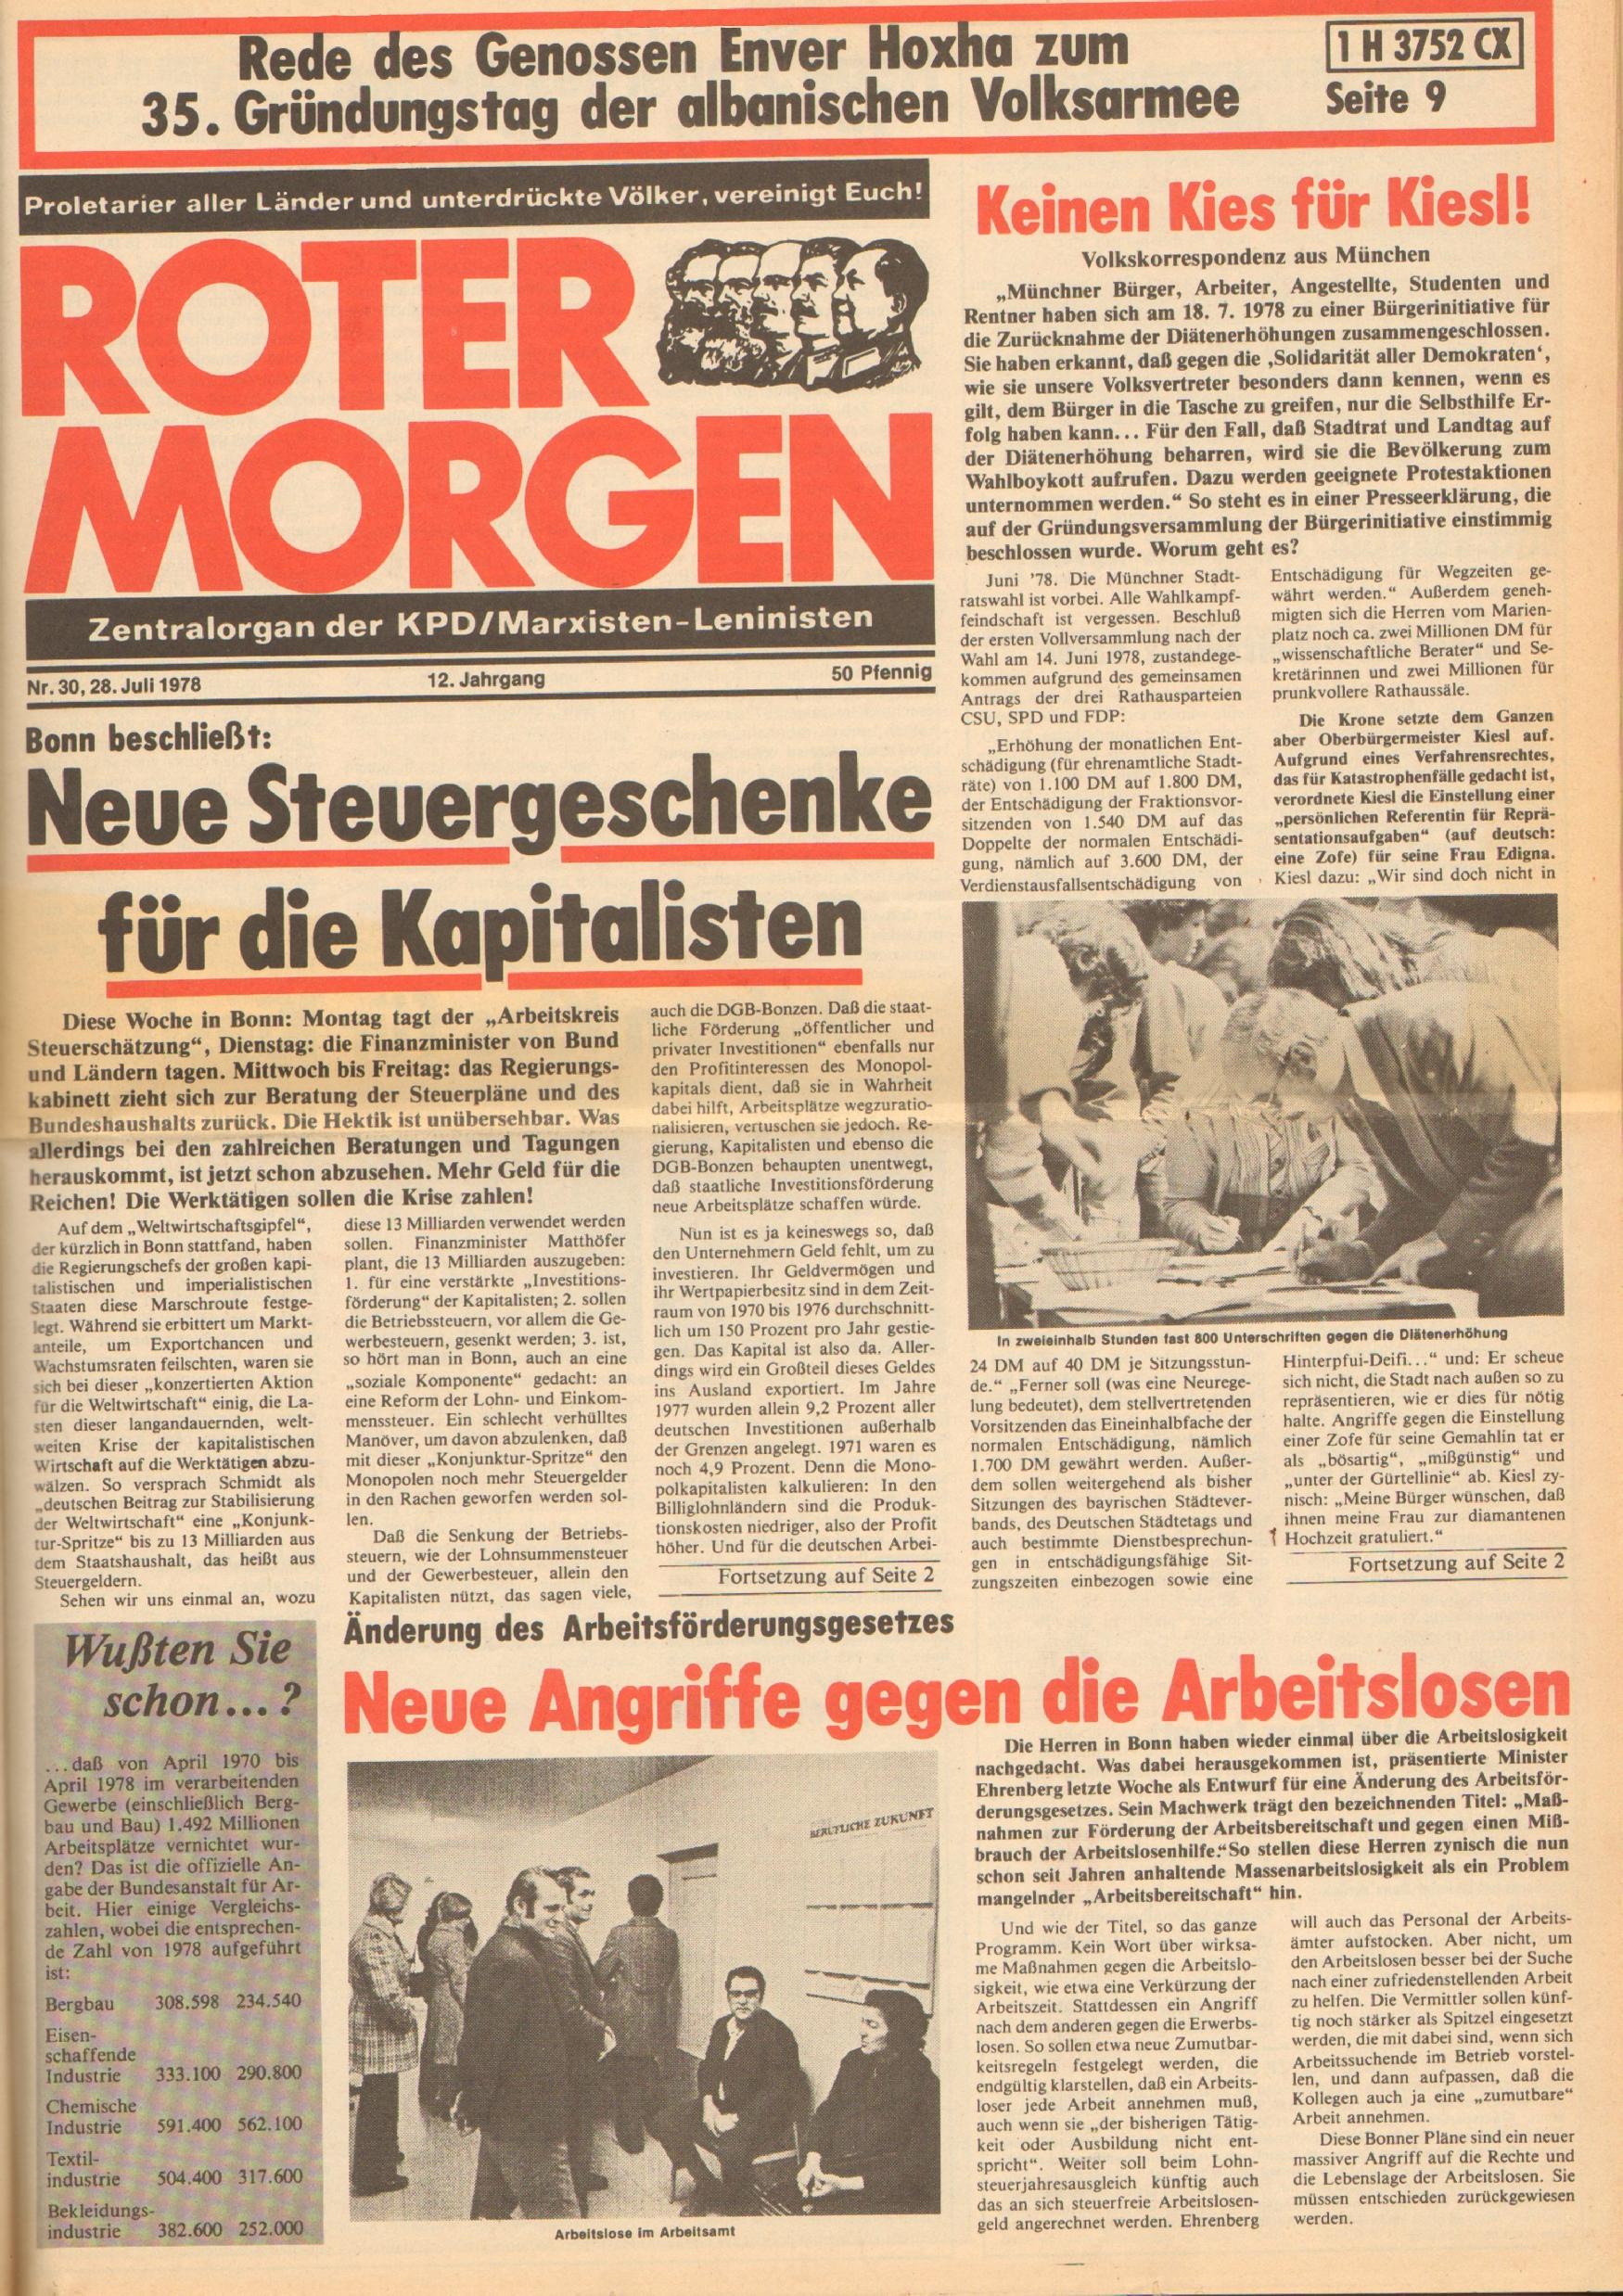 Roter Morgen, 12. Jg., 28. Juli 1978, Nr. 30, Seite 1